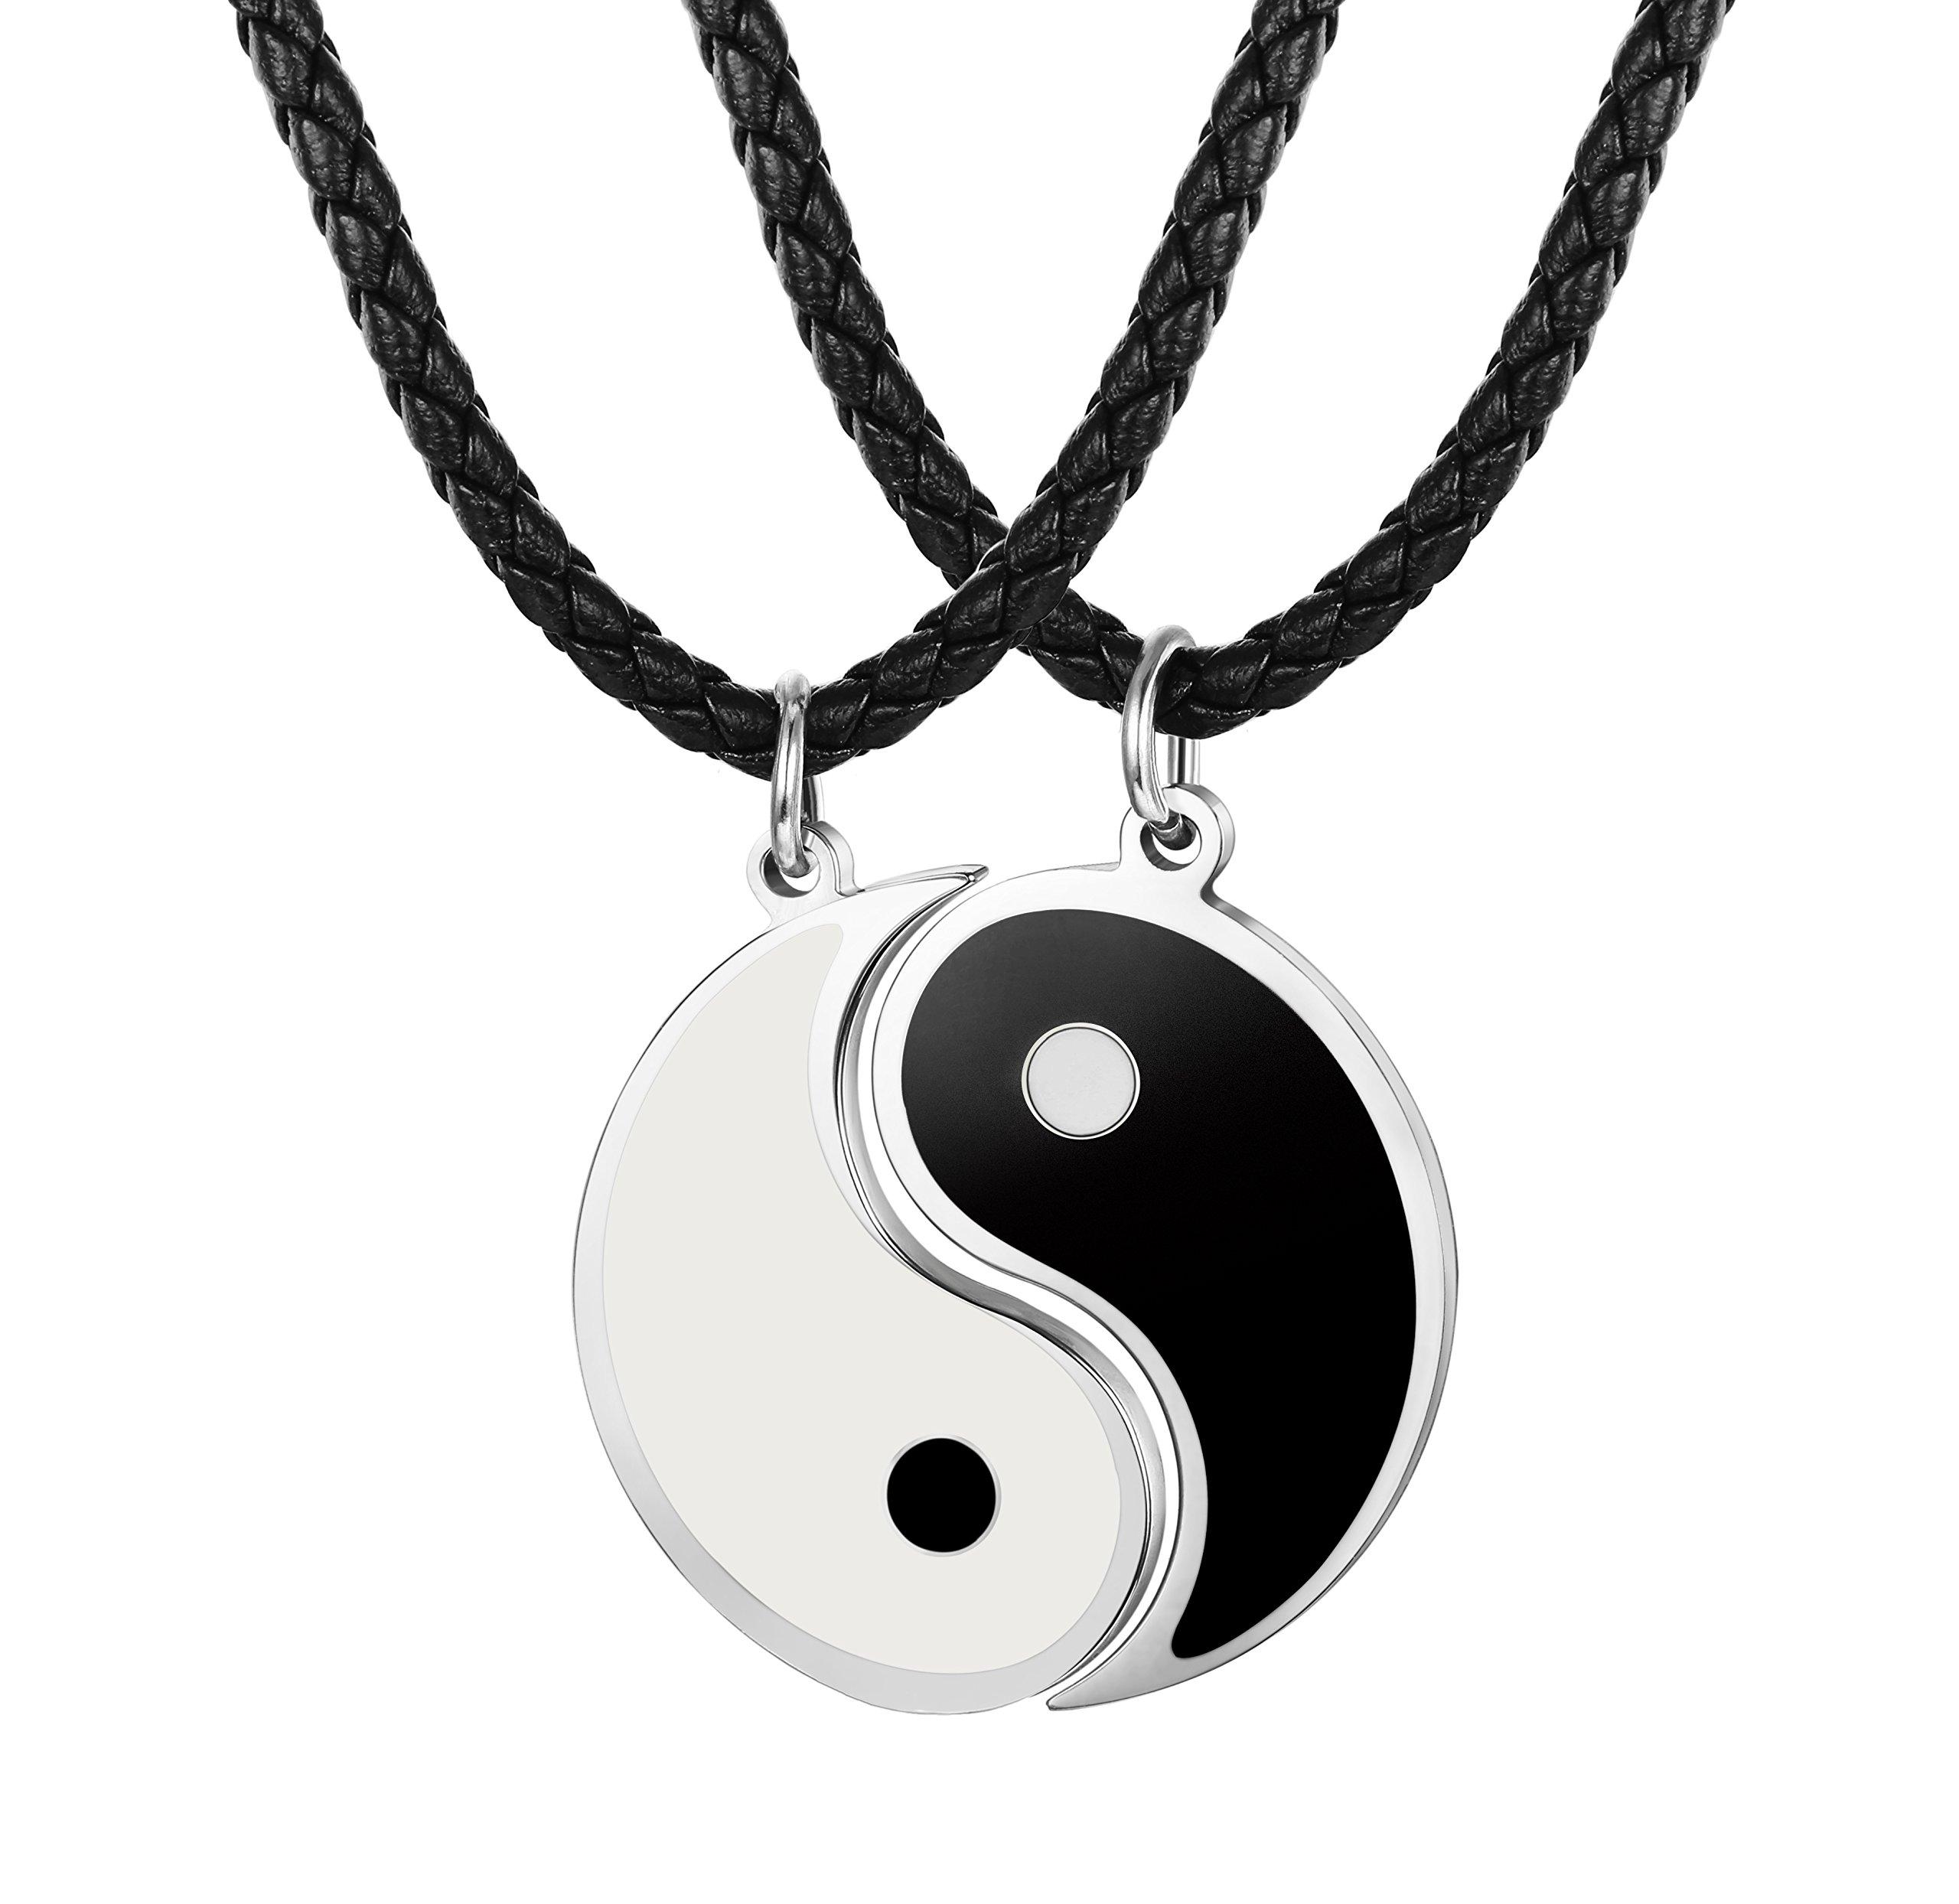 b7e7966e43f6 Besteel 3MM Collar Cuero Yin Yang para Hombre Mujer Colgante Taichi Acero  Inoxidable Collar Pareja Cadena